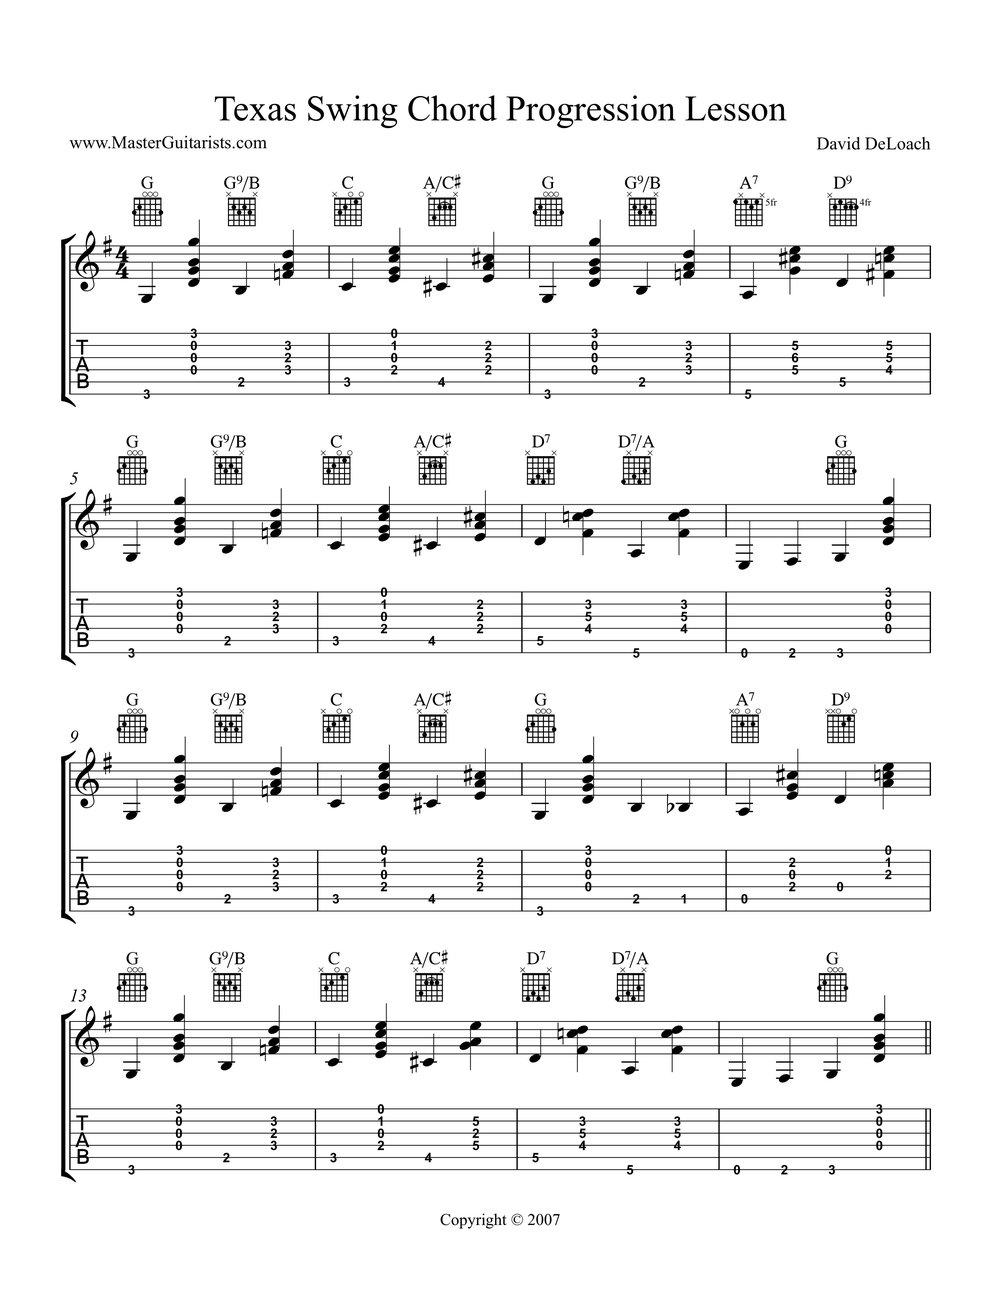 Texas Swing Chord Progression Lesson1318081131-1.jpeg